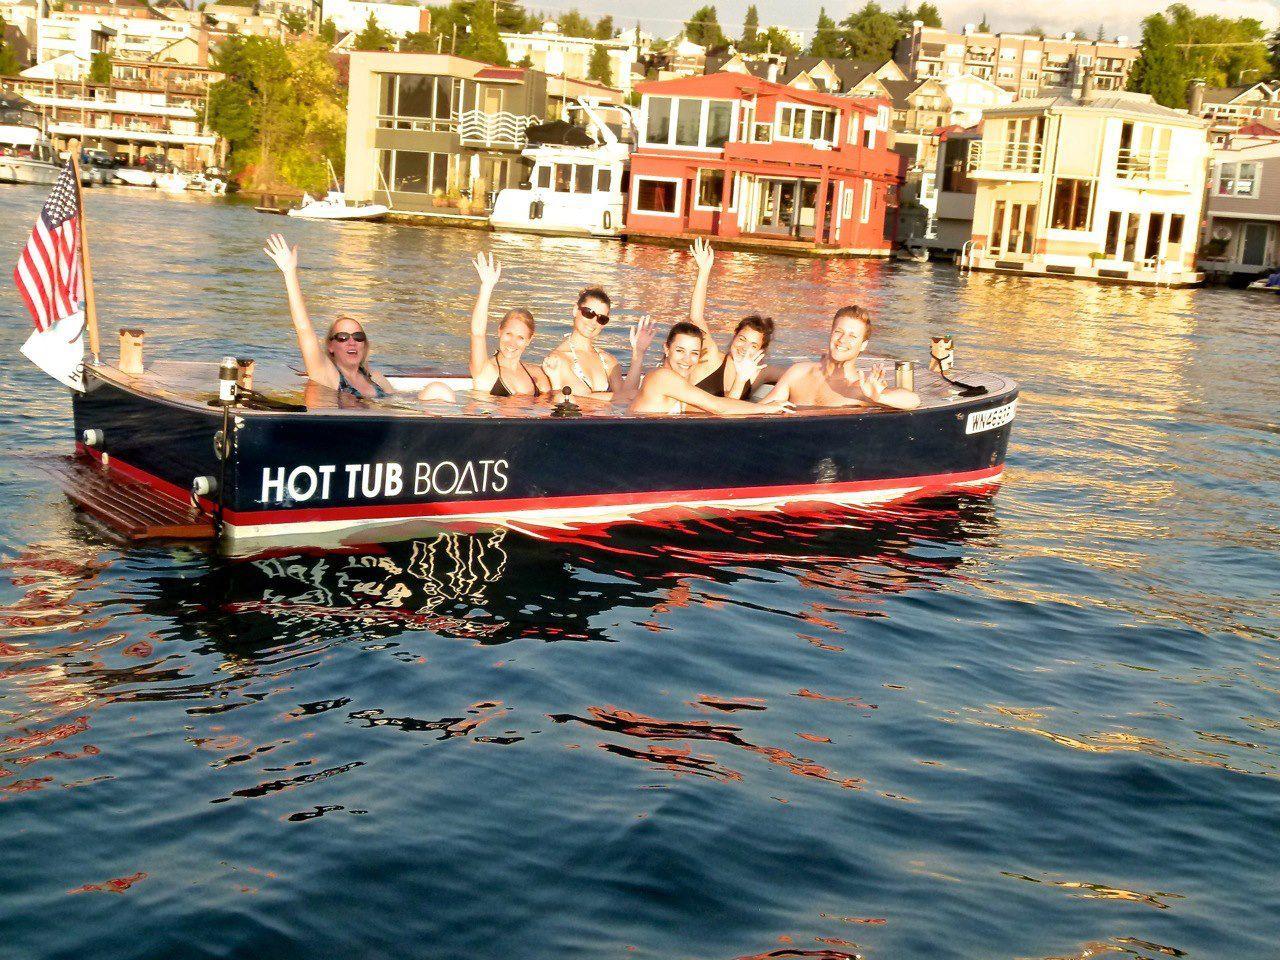 hot tub boats hottubboats houseboats lakeunion lake union then now pinterest tub cool. Black Bedroom Furniture Sets. Home Design Ideas